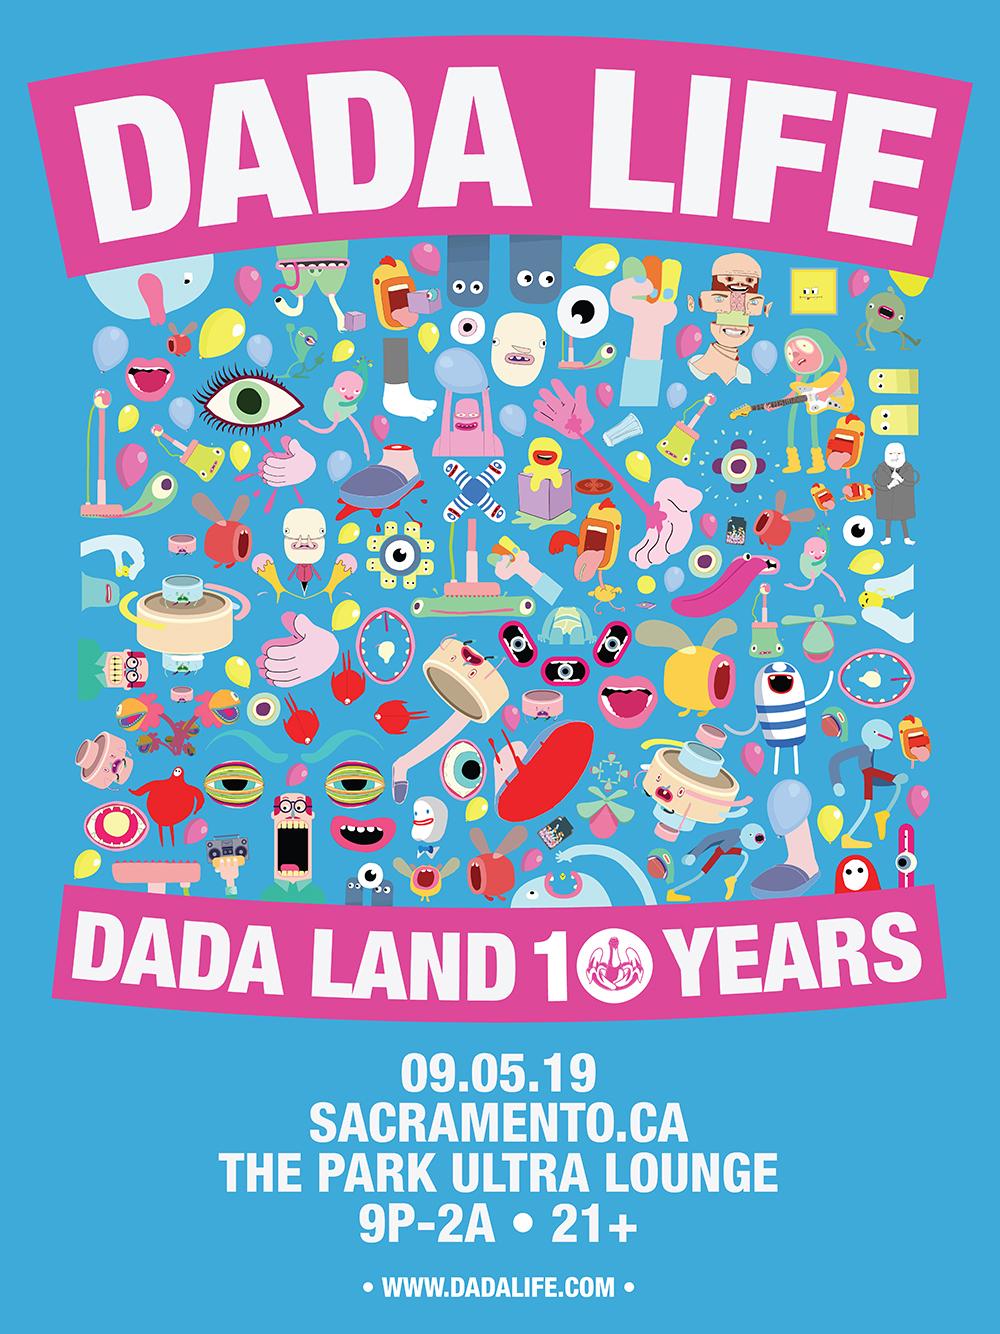 DADA LIFE - Dada Land 10 Years Tour Tickets, Thu, Sep 5, 2019 at 9